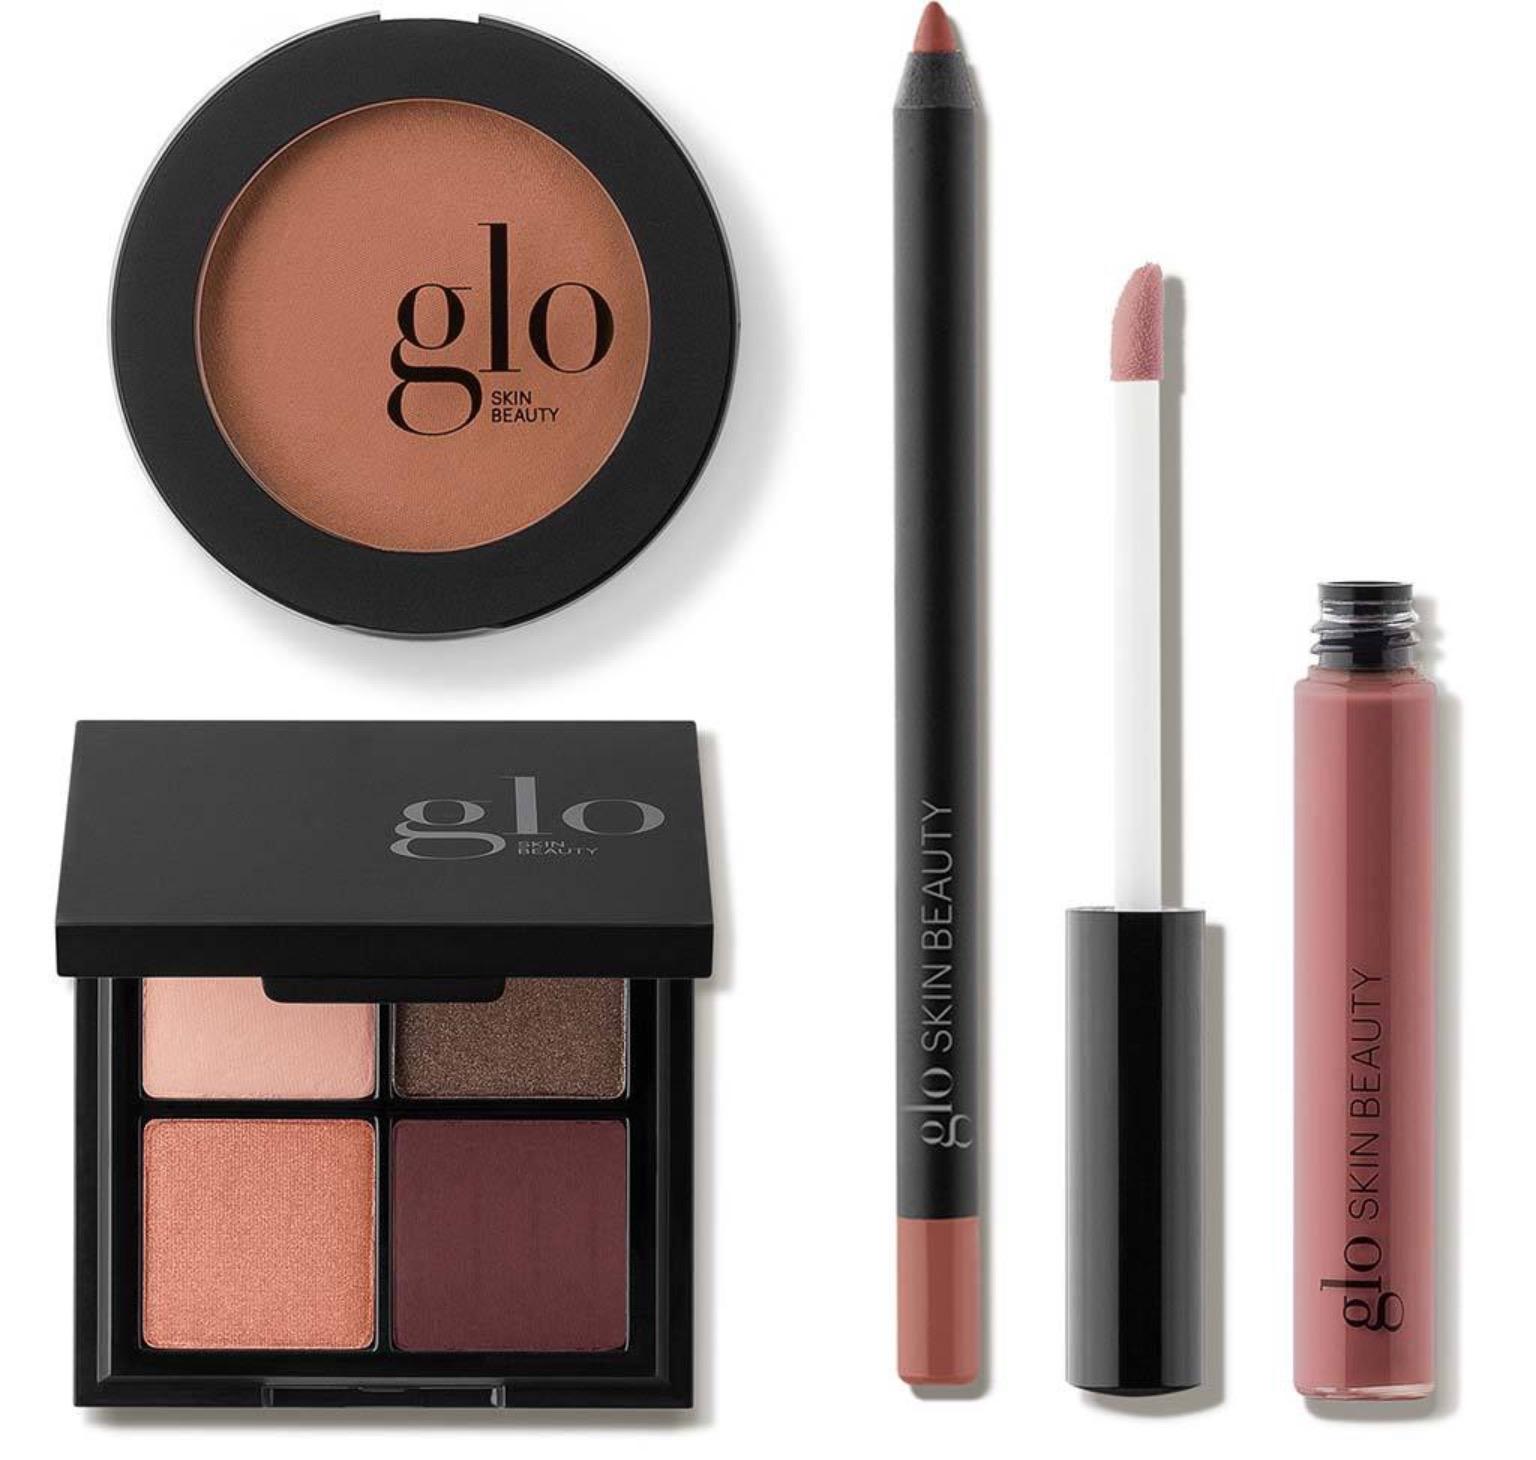 glo makeup.jpg